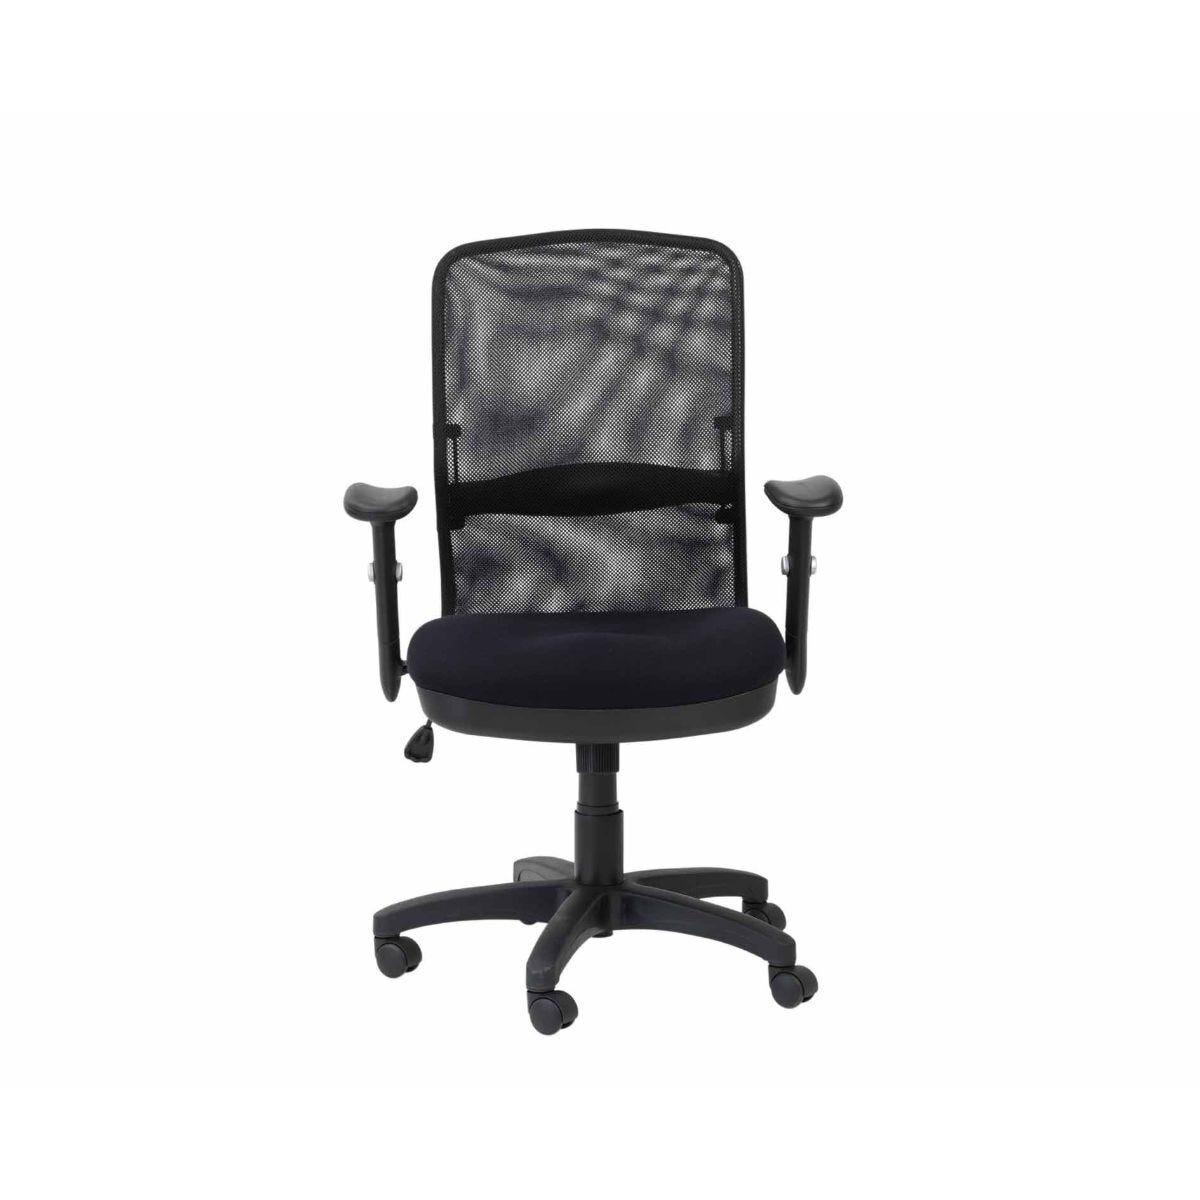 Alphason Dakota Mesh Back Managerial Office Chair